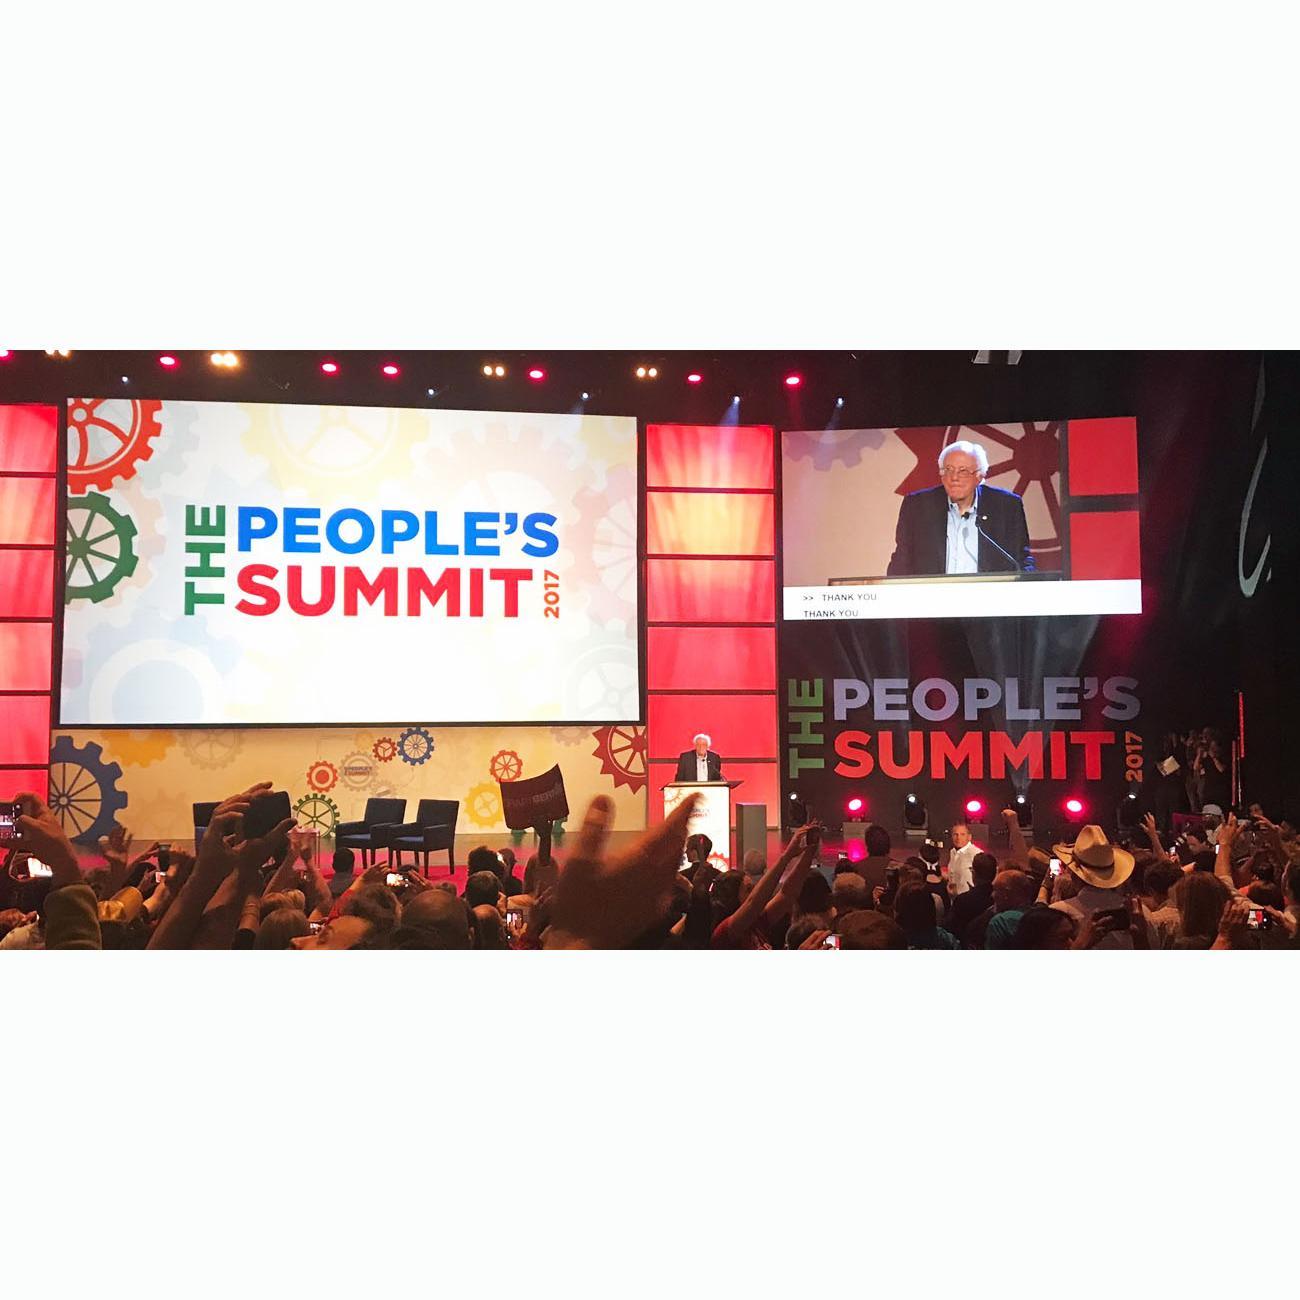 Bernie Sanders - The People's Summit 2017. Photo by Adam Kustra